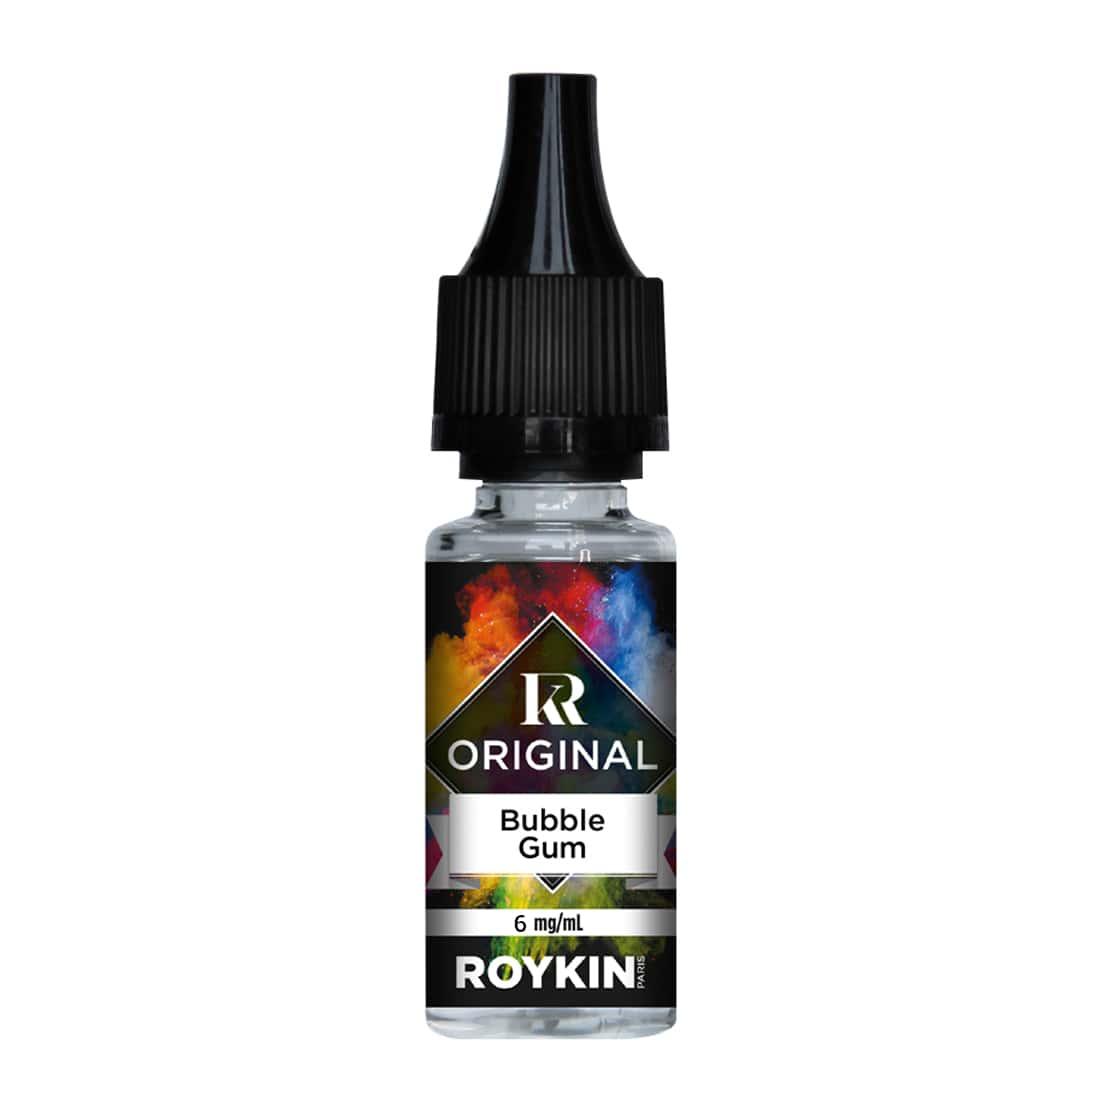 Photo #2 de E liquide Roykin Original Bubble Gum